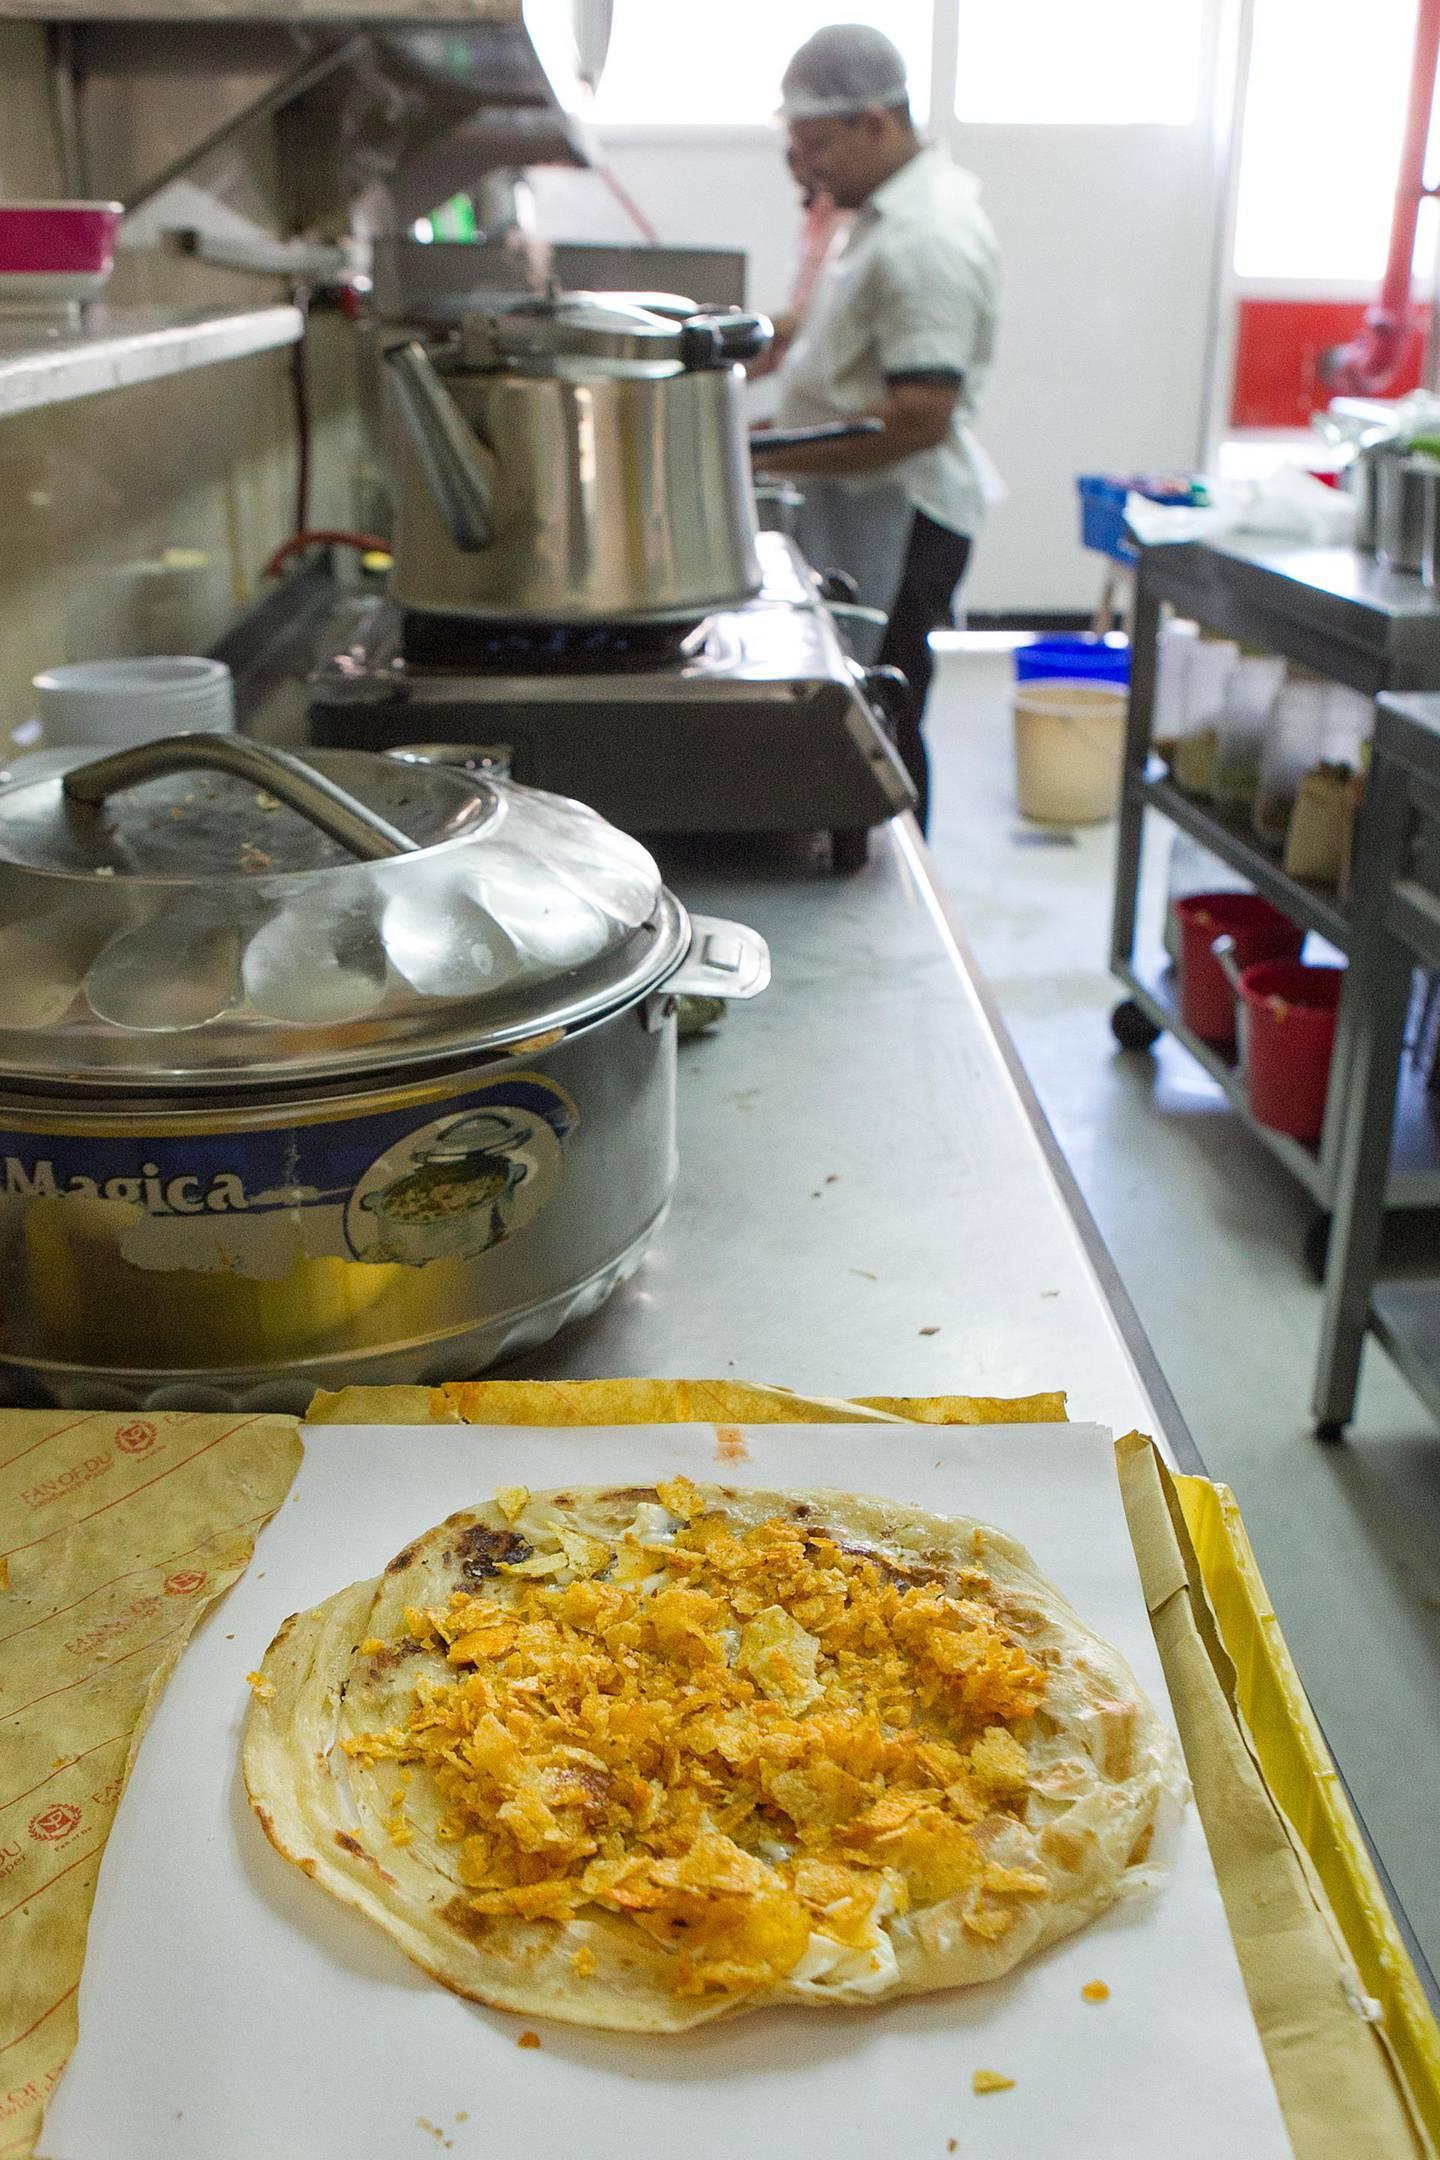 Abu Dhabi, United Arab Emirates. November 27, 2013///  Chips Oman sandwich at Baith Al Baraka (House of Blessings) cafeteria Bain Al Jessrain in Abu Dhabi, United Arab Emirates. Mona Al-Marzooqi/ The National   Reporter: Anna Zacharias Section: Weekend *** Local Caption ***  131127-MM-Chipsomansandwich-002.JPG